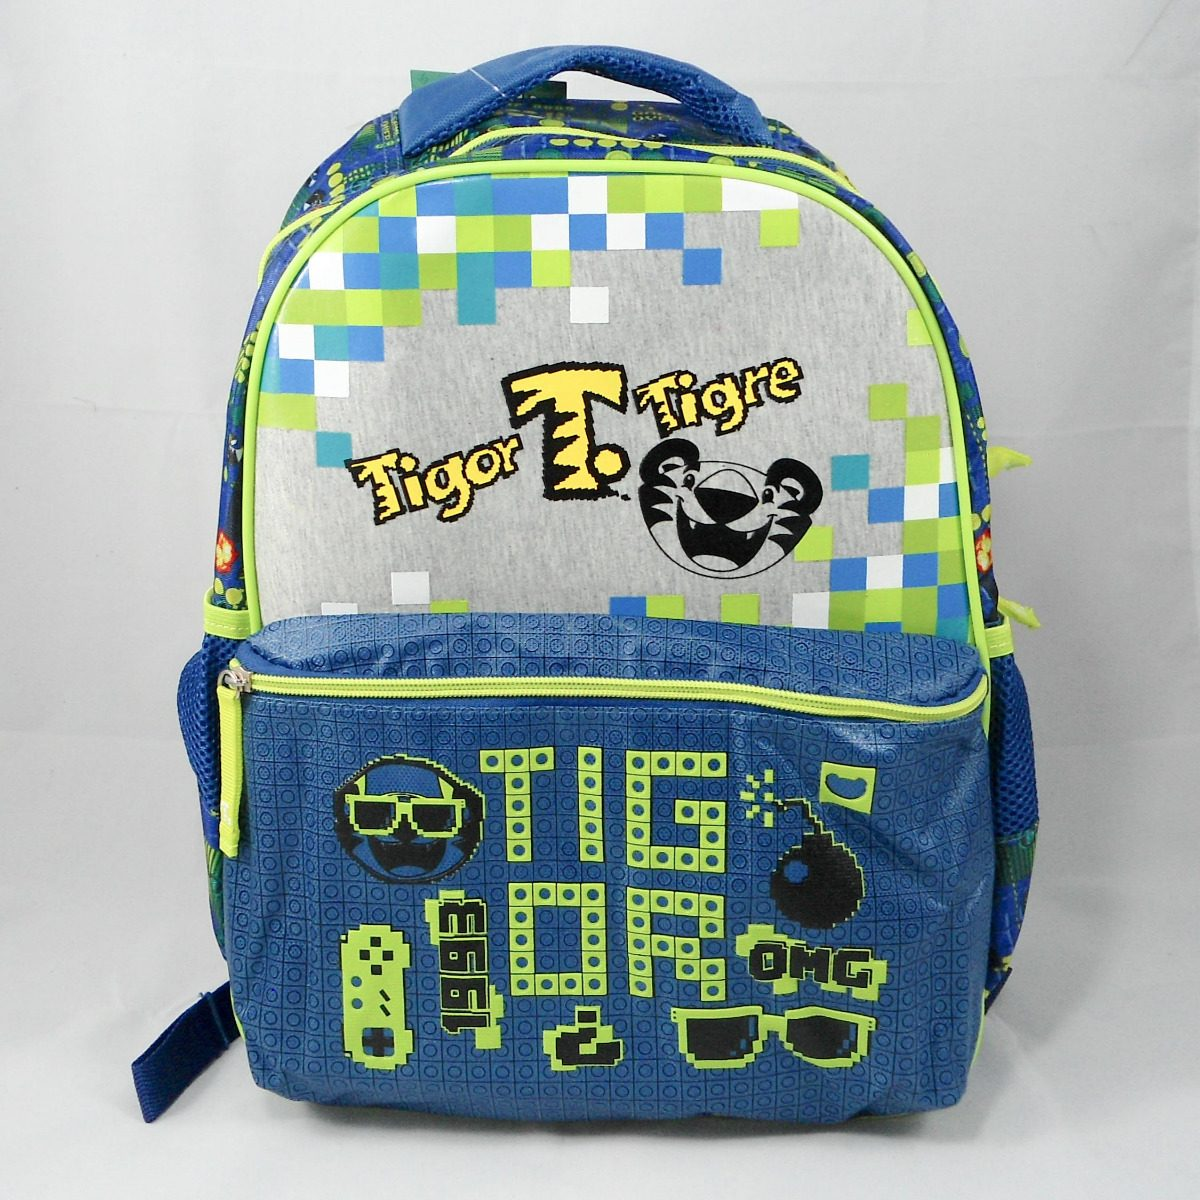 4351c2e1bd kit escolar tigor t tigre 2018 mochila + estojo + garrafinha. Carregando  zoom.